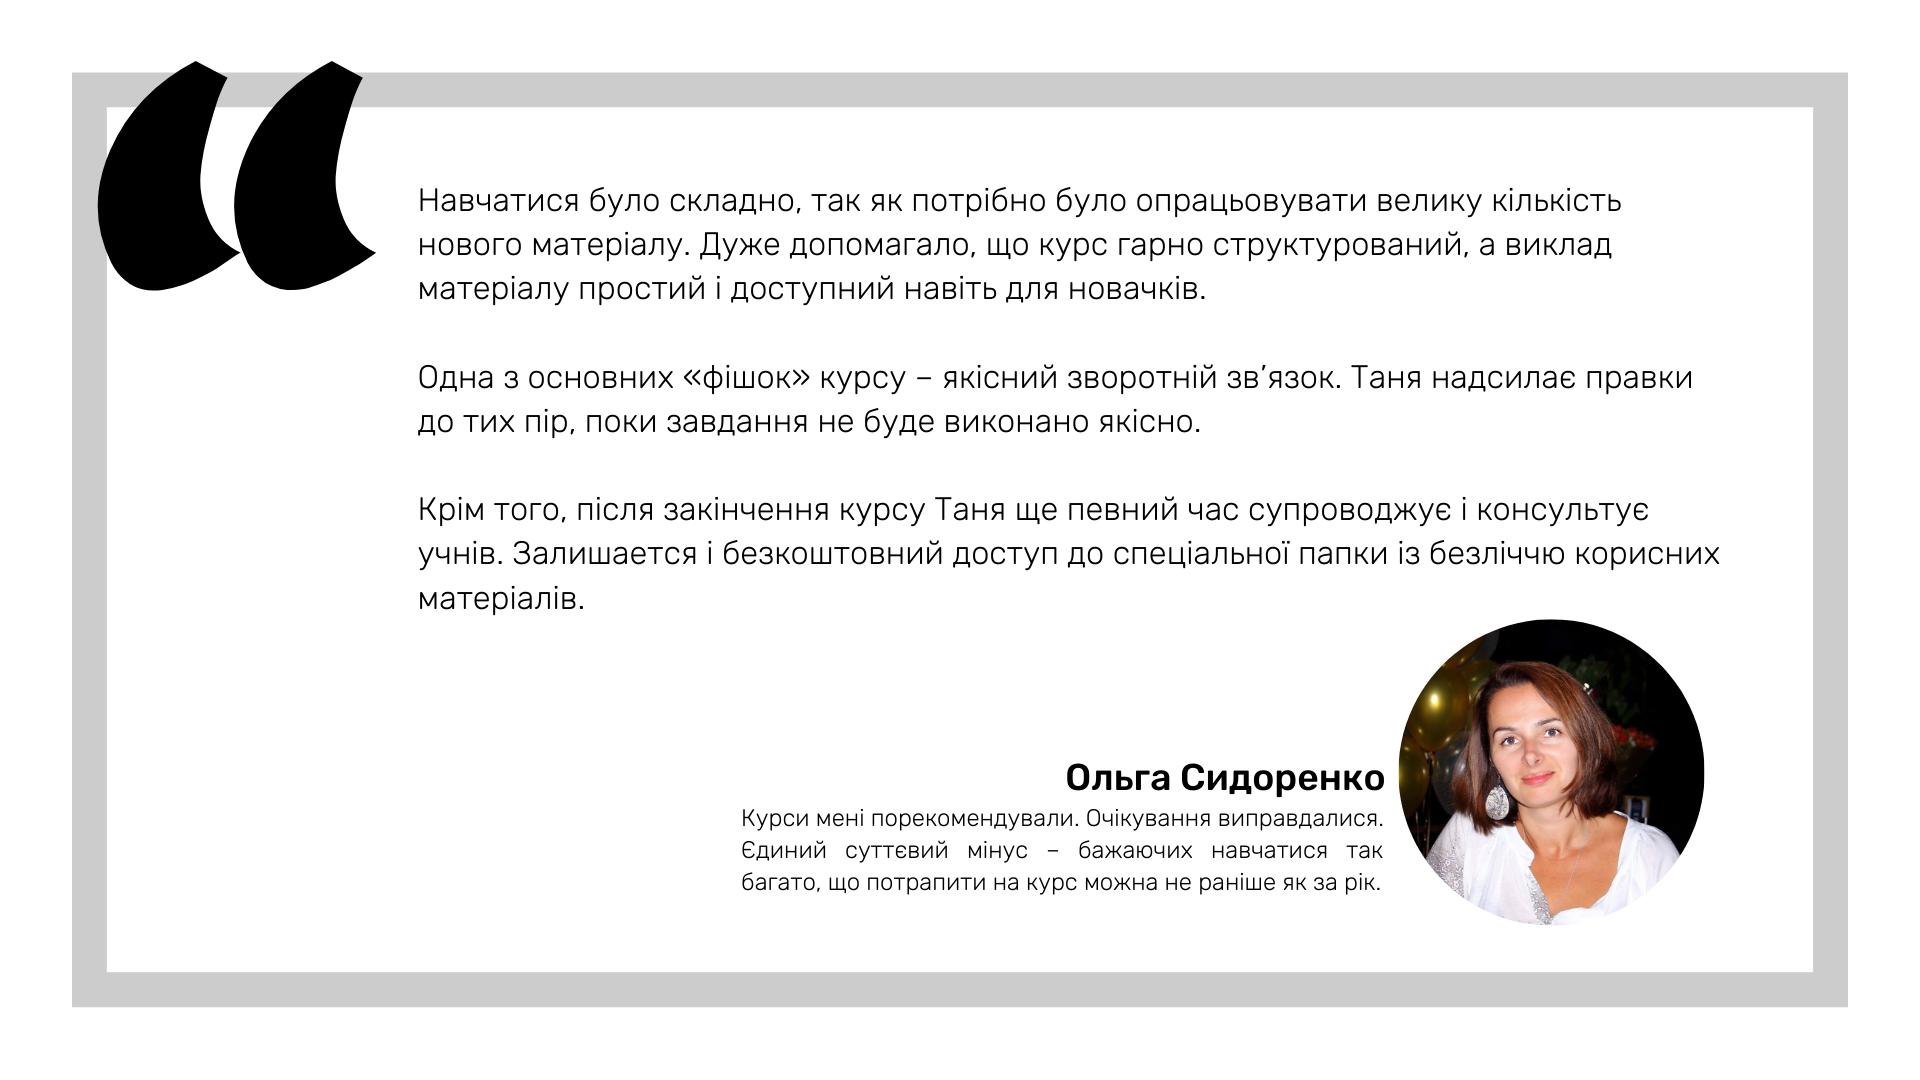 Отзыв о Школе Ольги Сидоренко